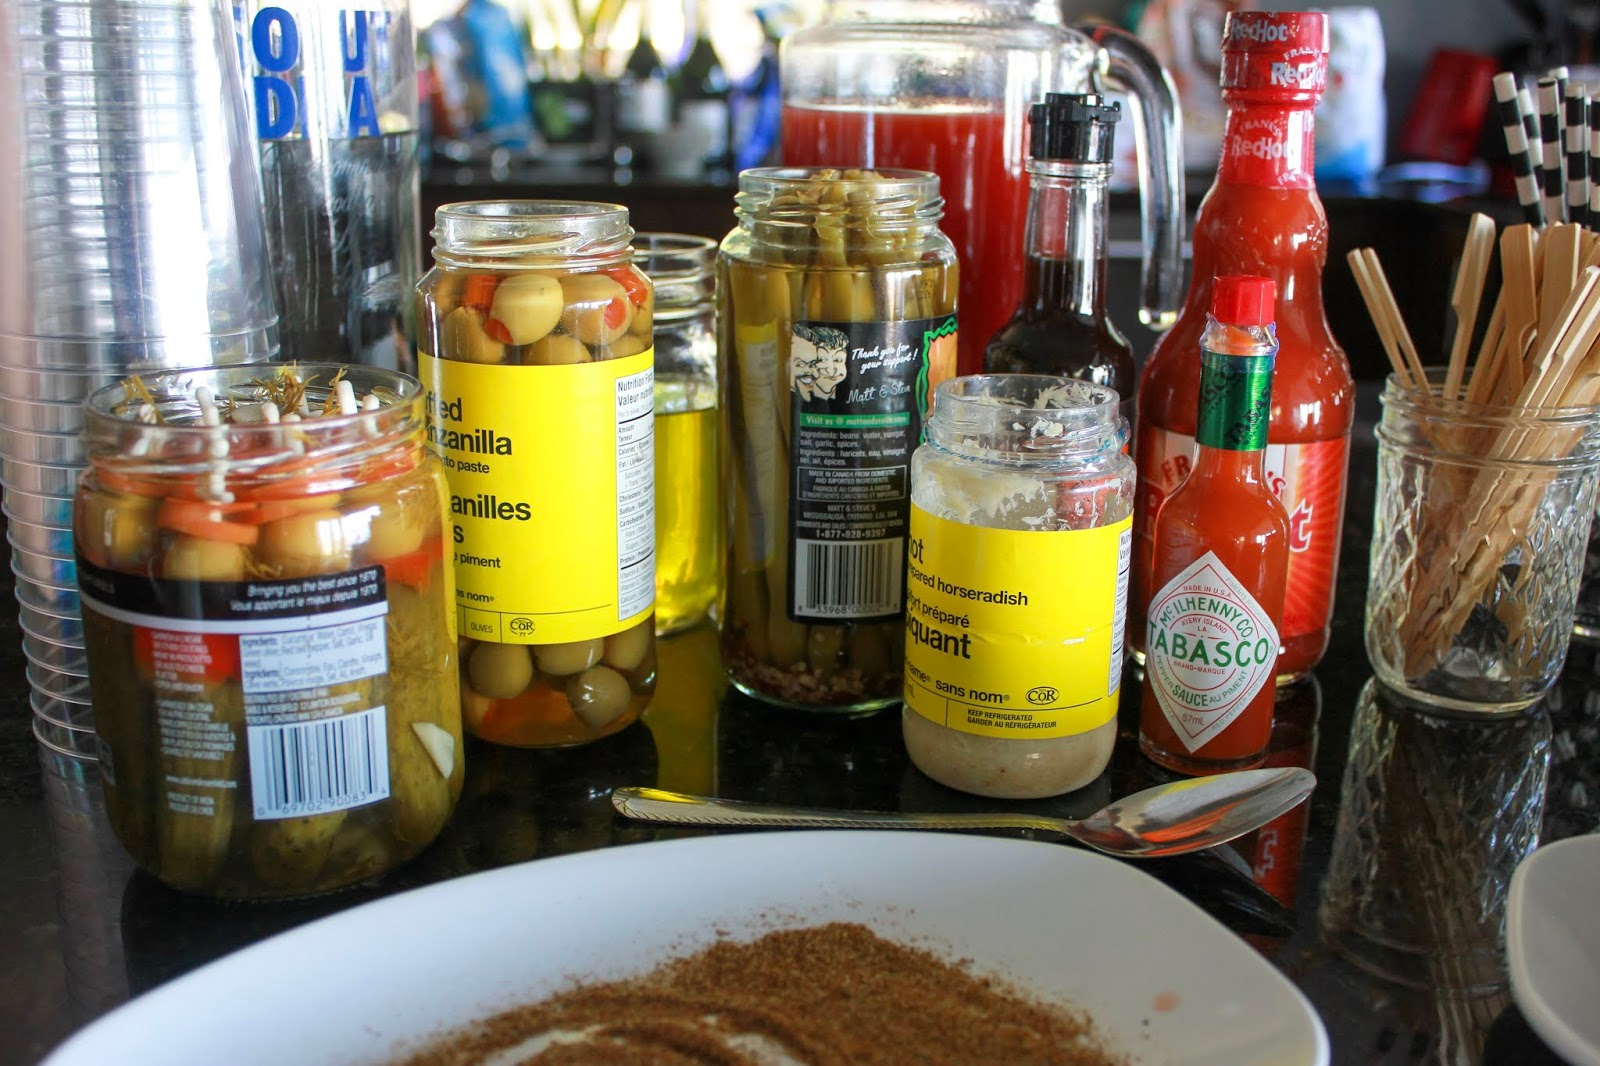 build it yourself caesar bar ingredients